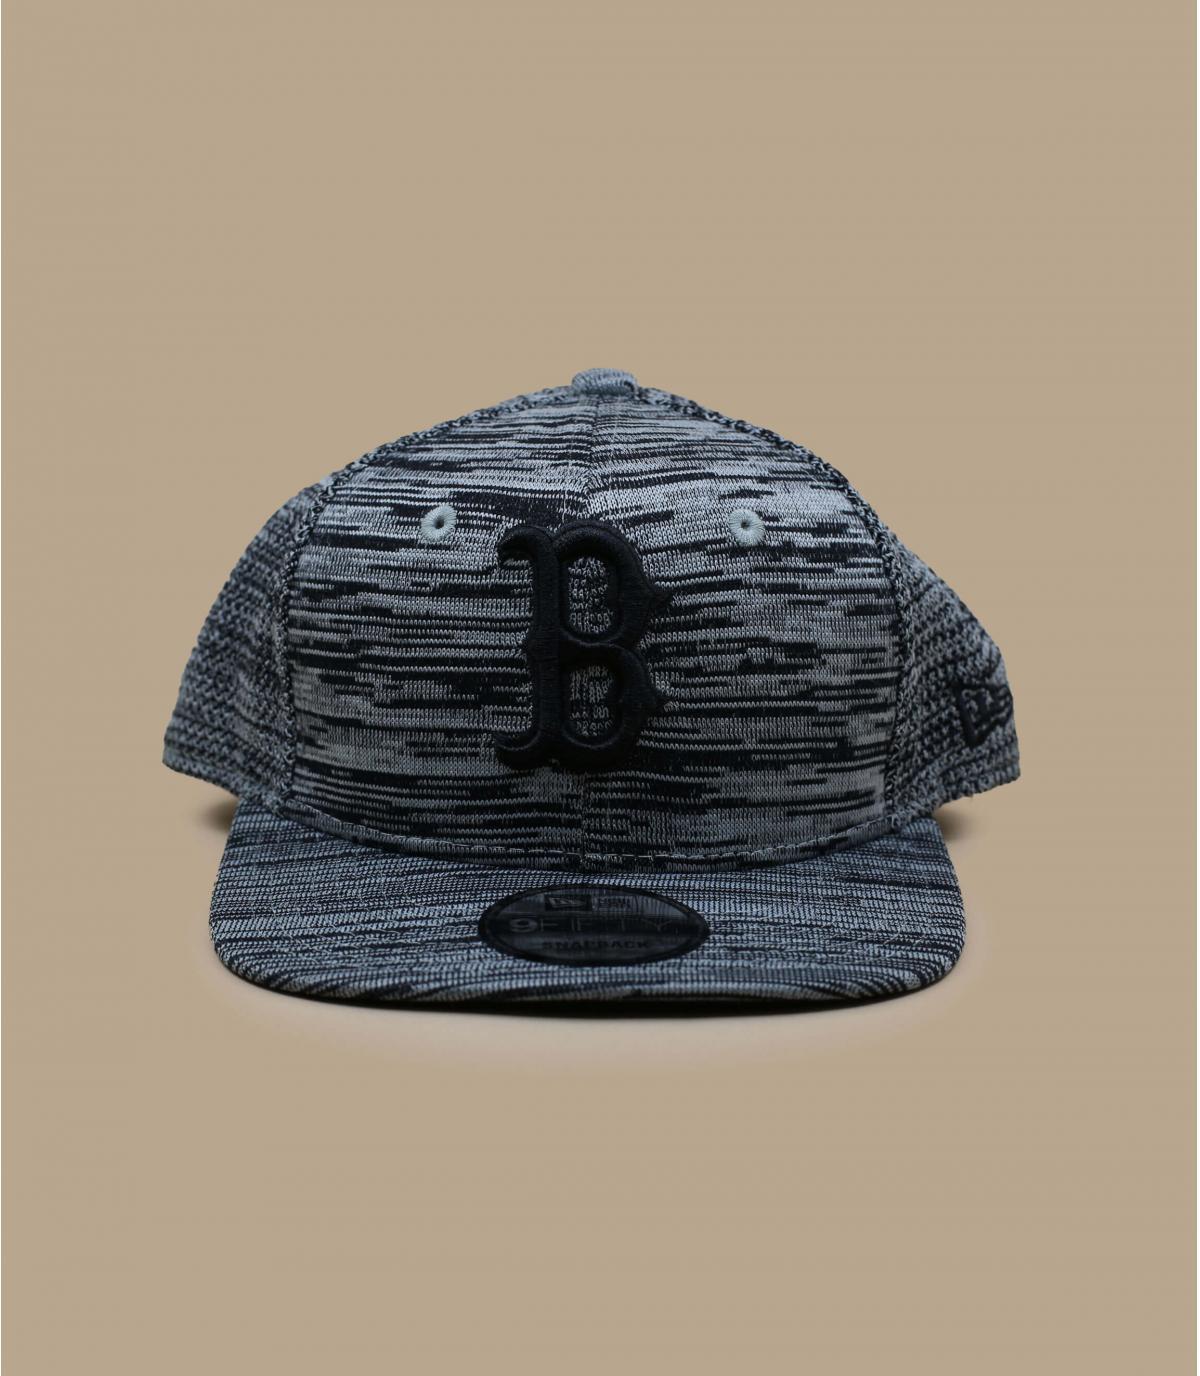 Detalles Engineered Fit 9Fifty Boston gray black imagen 2